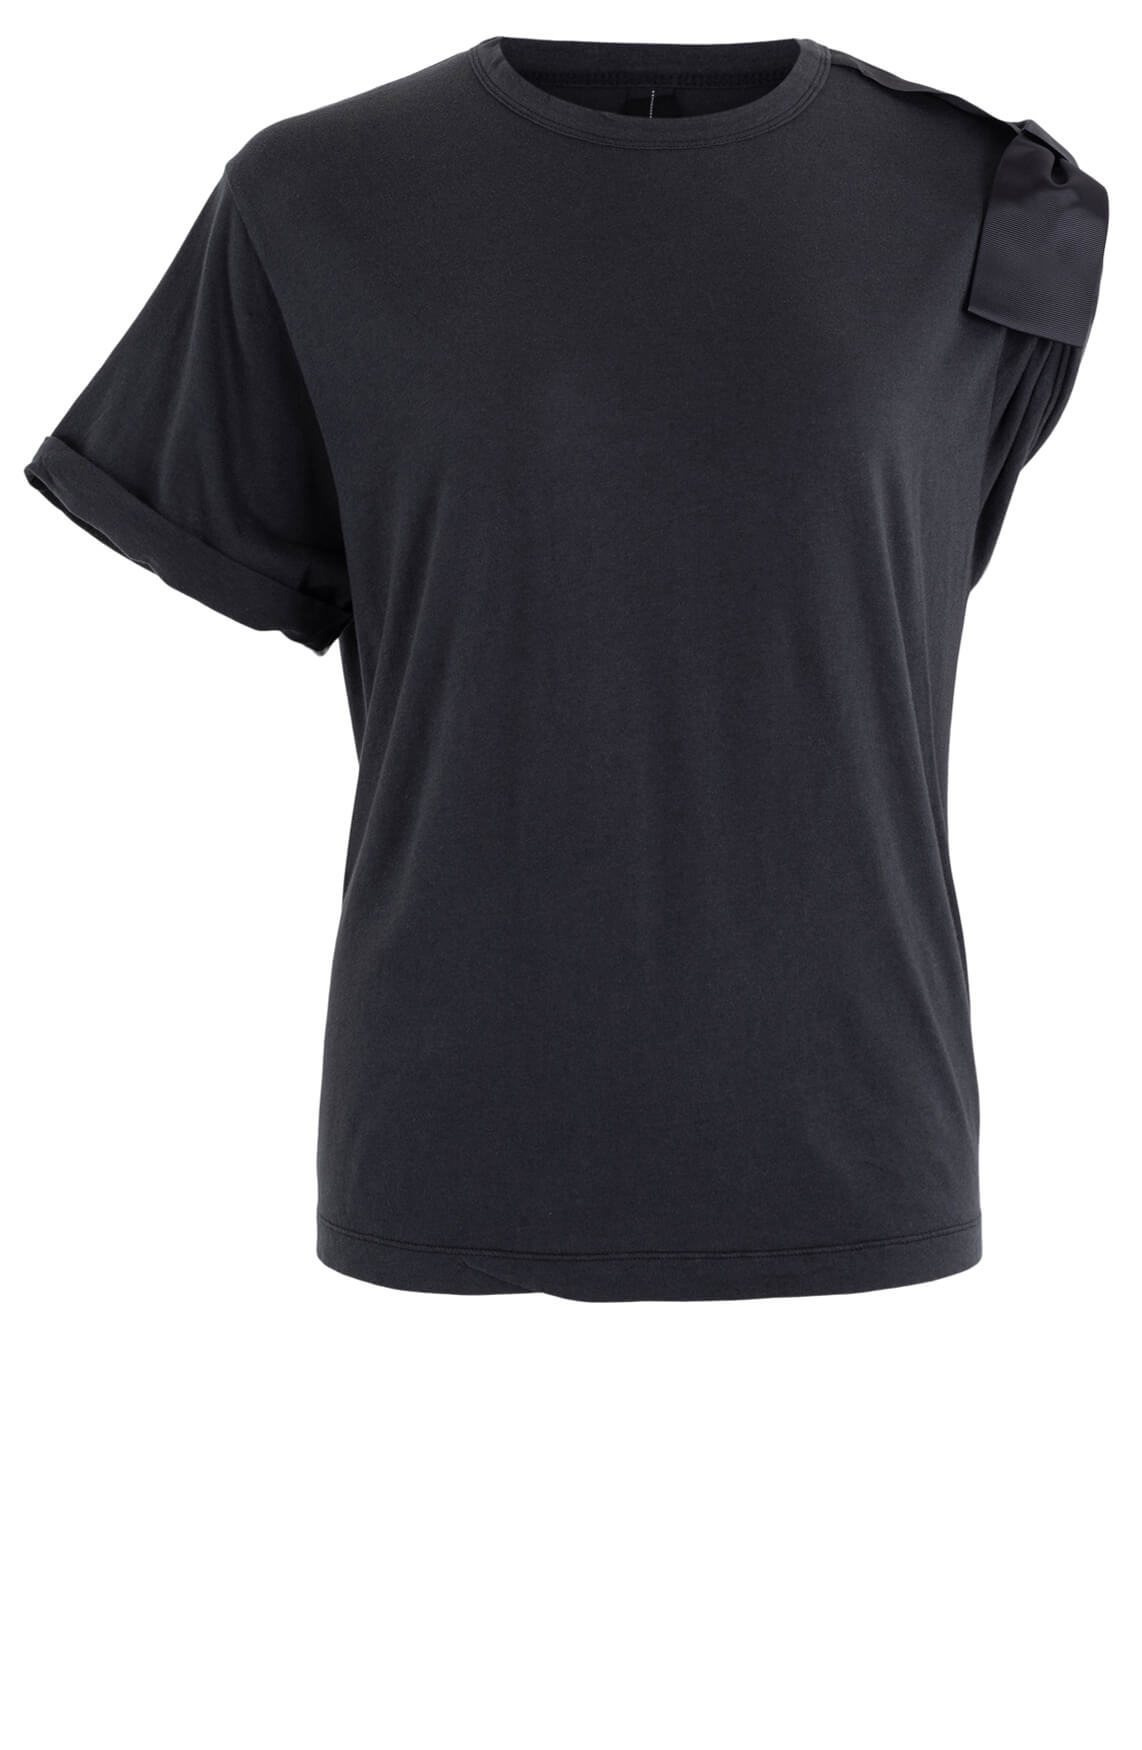 10 Days Dames Shirt met strik Zwart